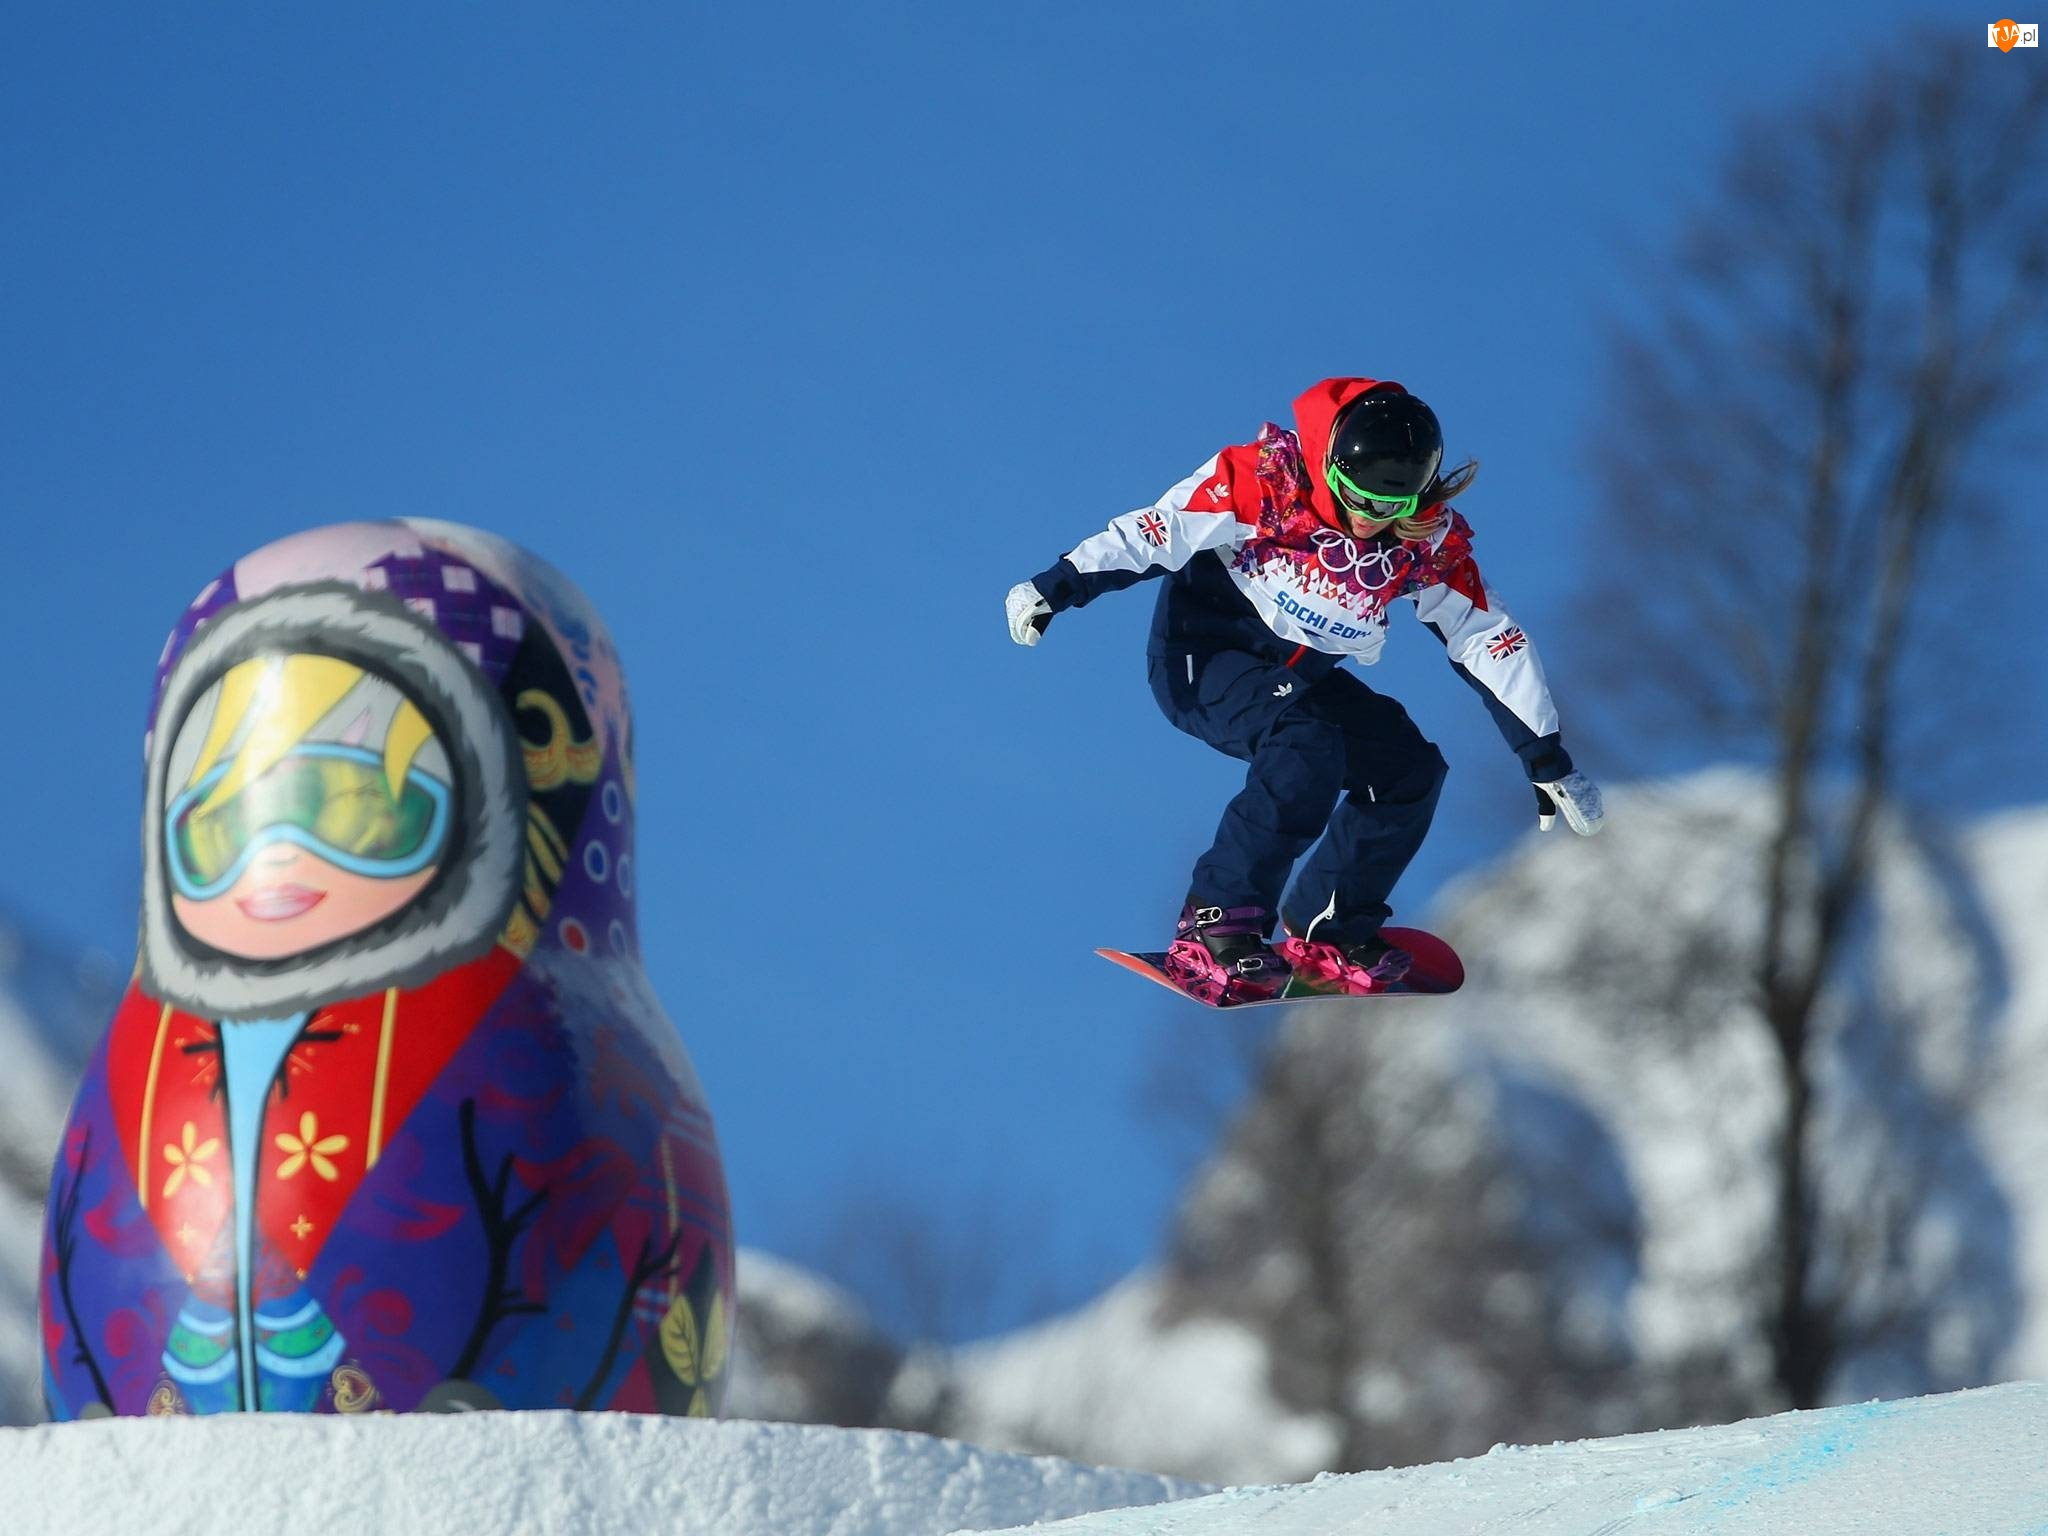 Olimpiada, Brązowa, Jenny Jones, Snowbording, Sochi, Slopestyle, Medalistka